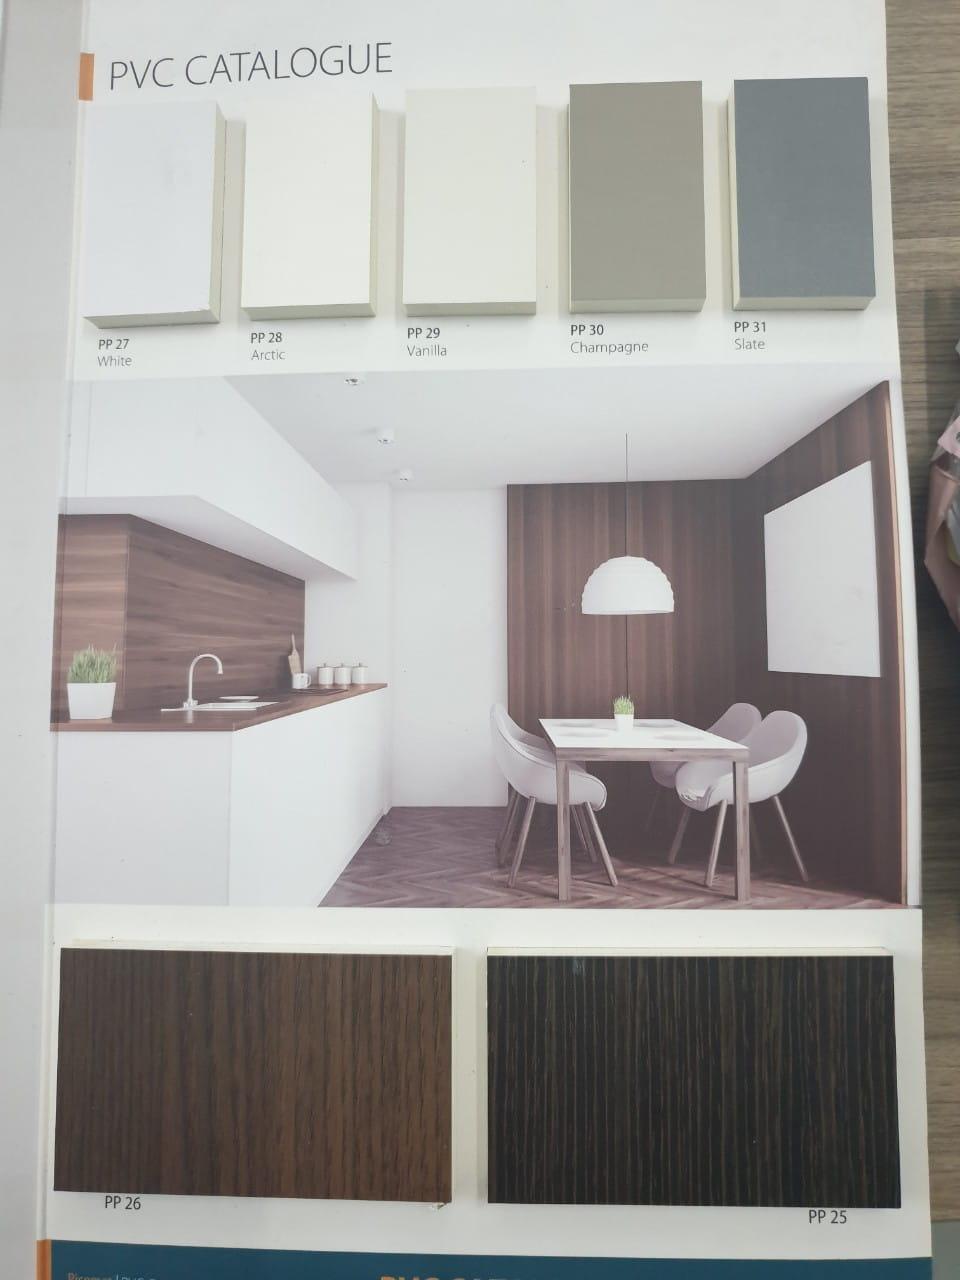 Catalogue ván nhựa picomat PVC